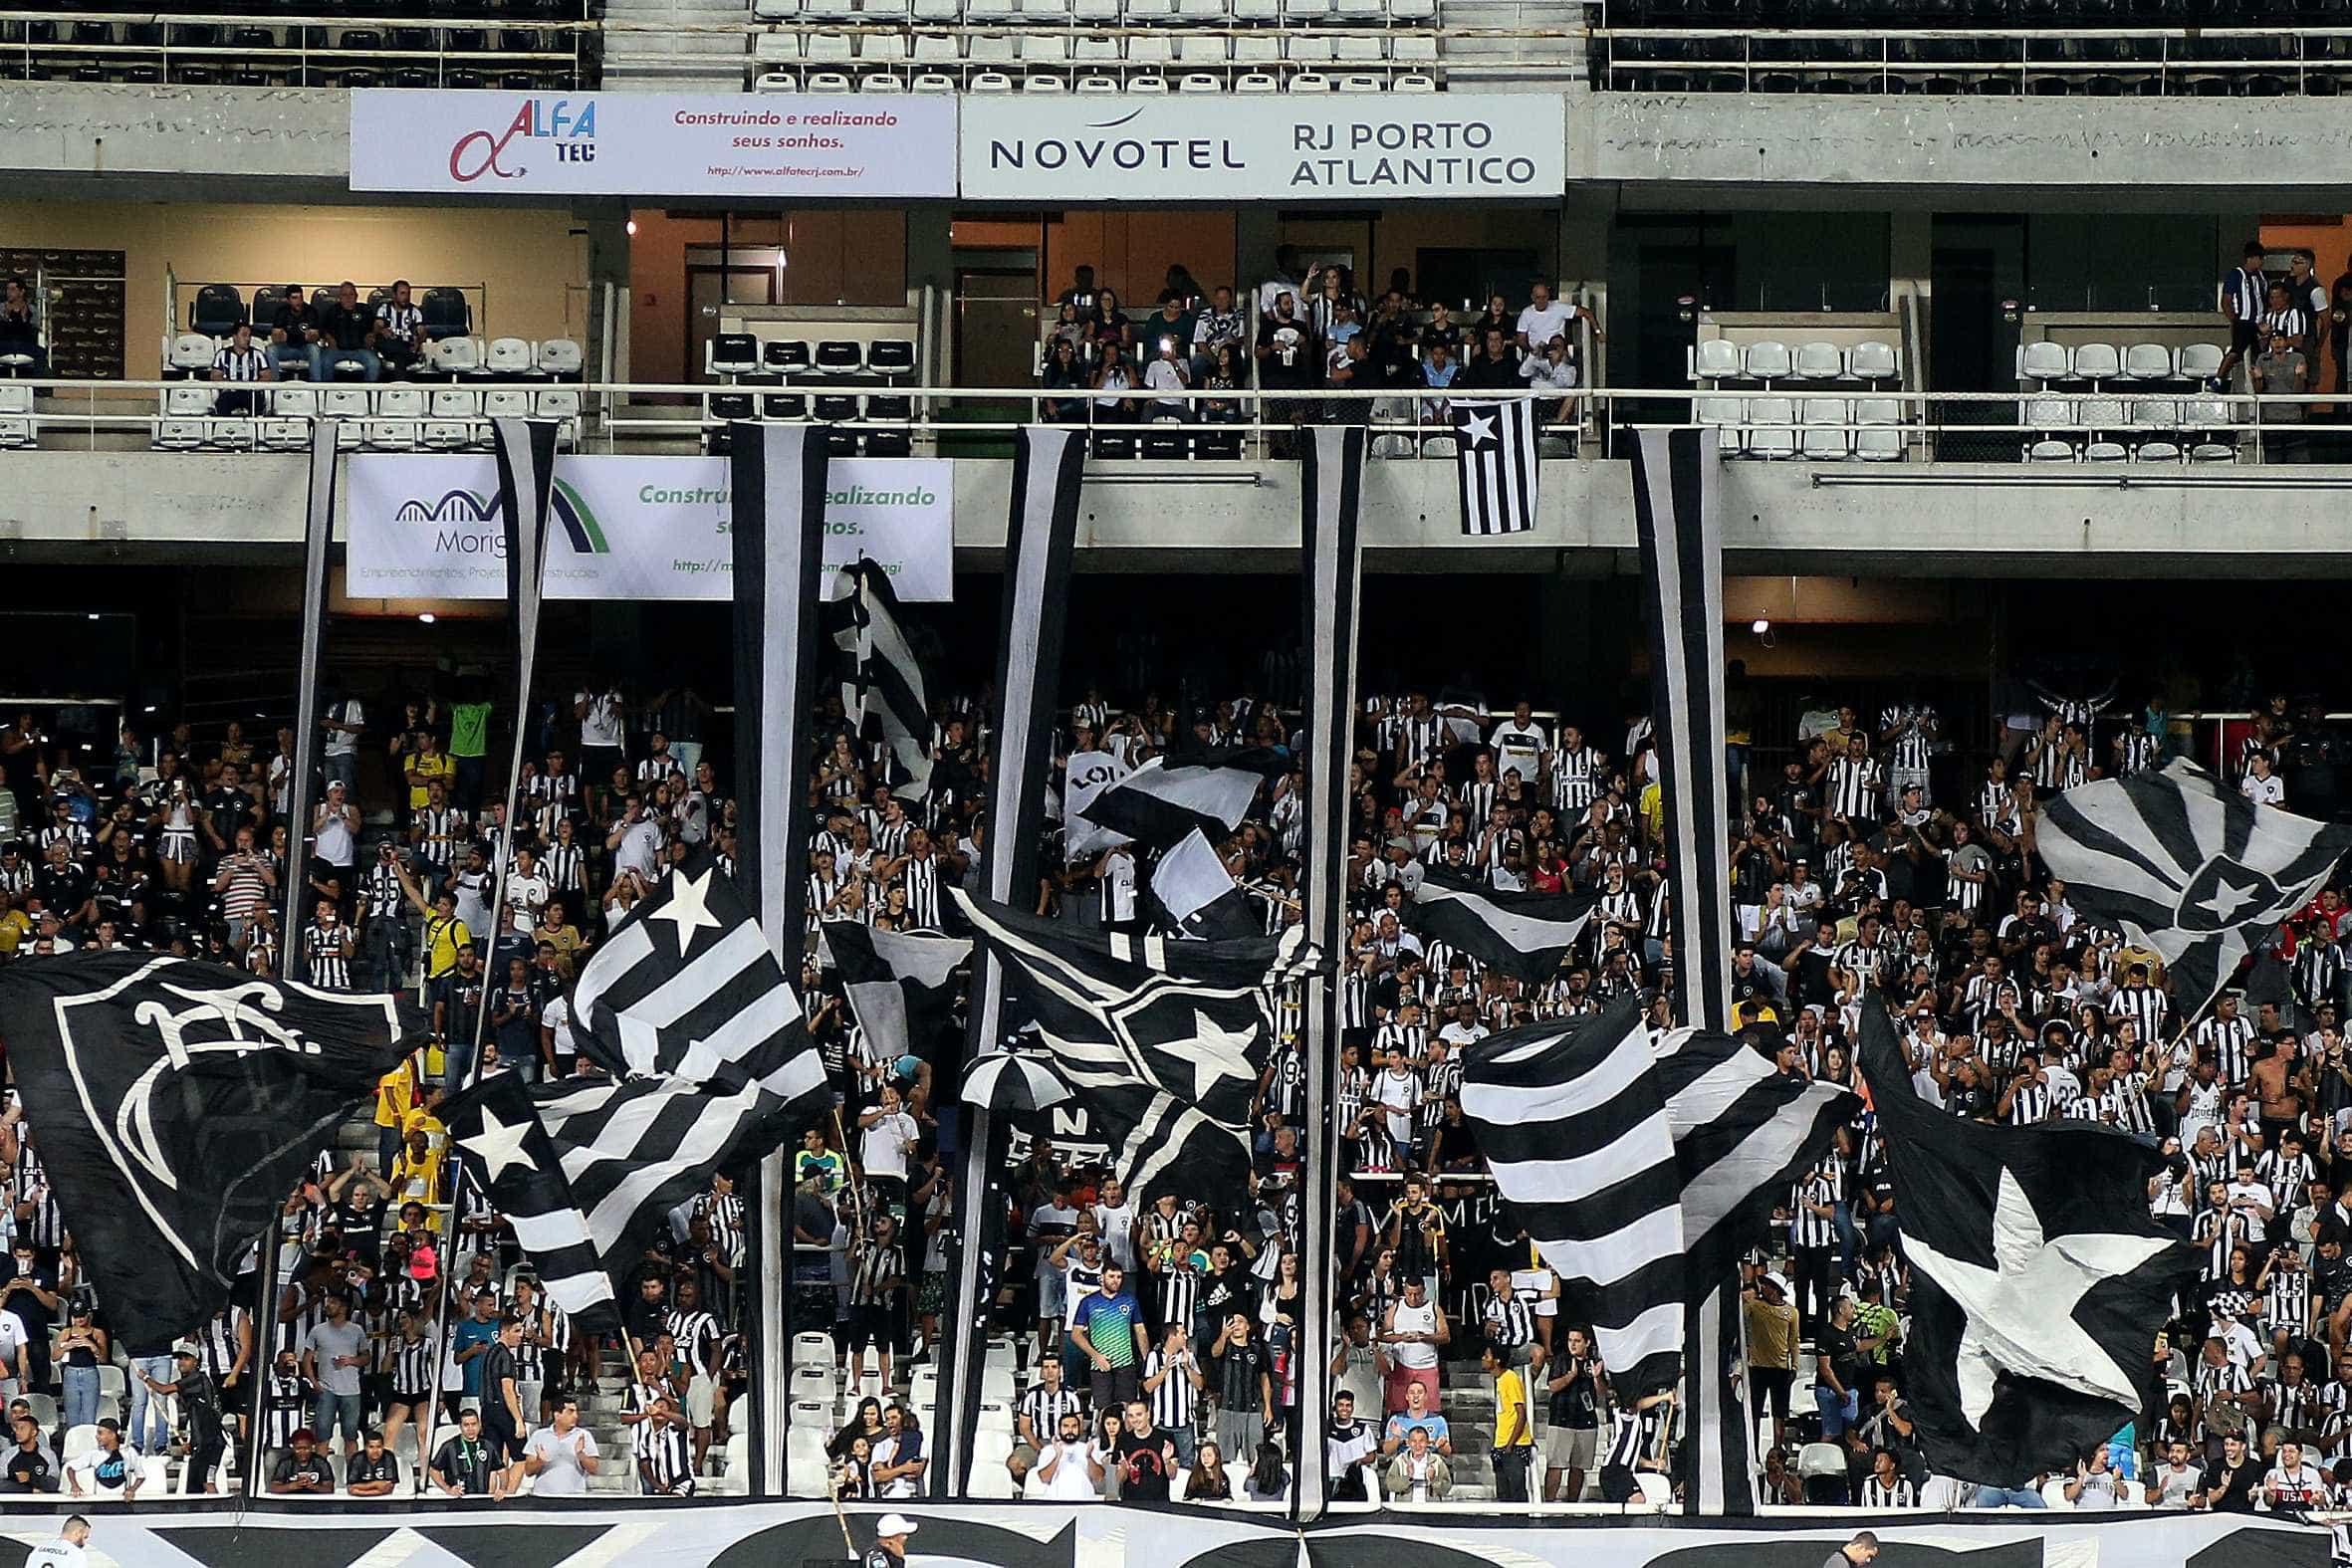 De olho na Libertadores, Botafogo recebe o Inter, que briga pelo título